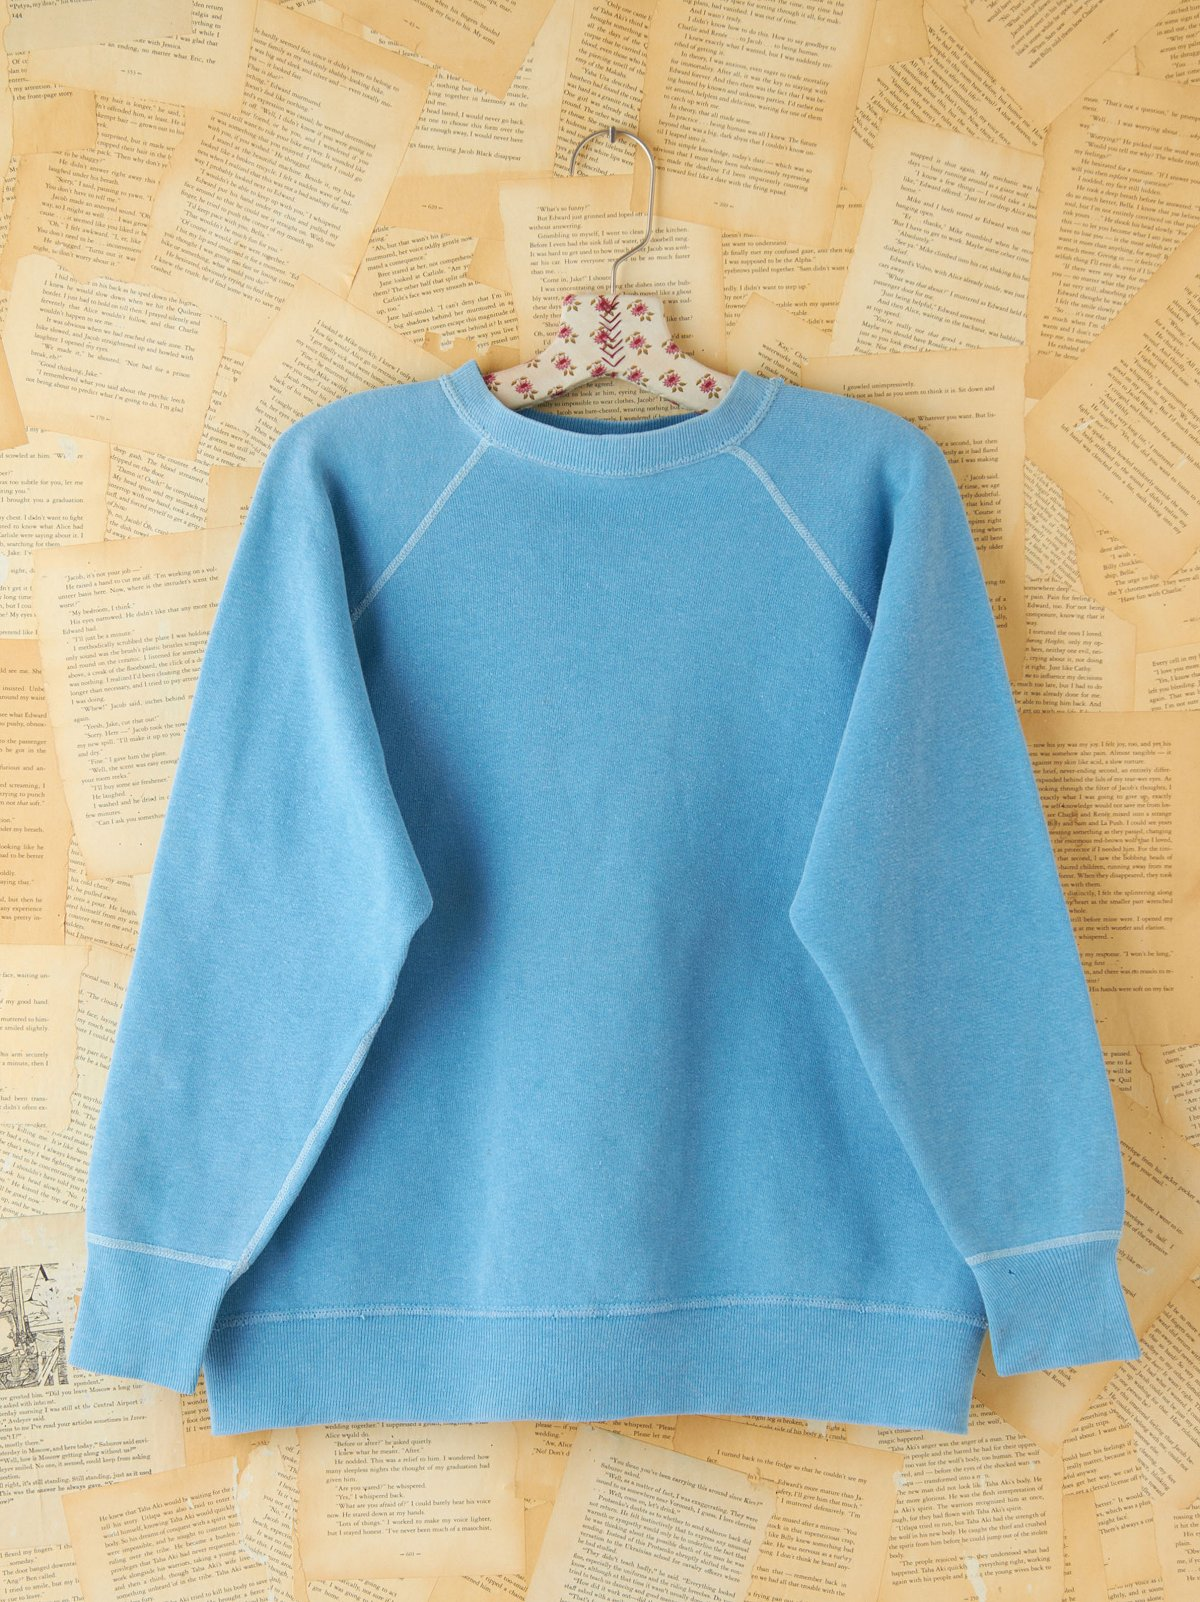 Vintage 1960s Blue Pullover Sweatshirt